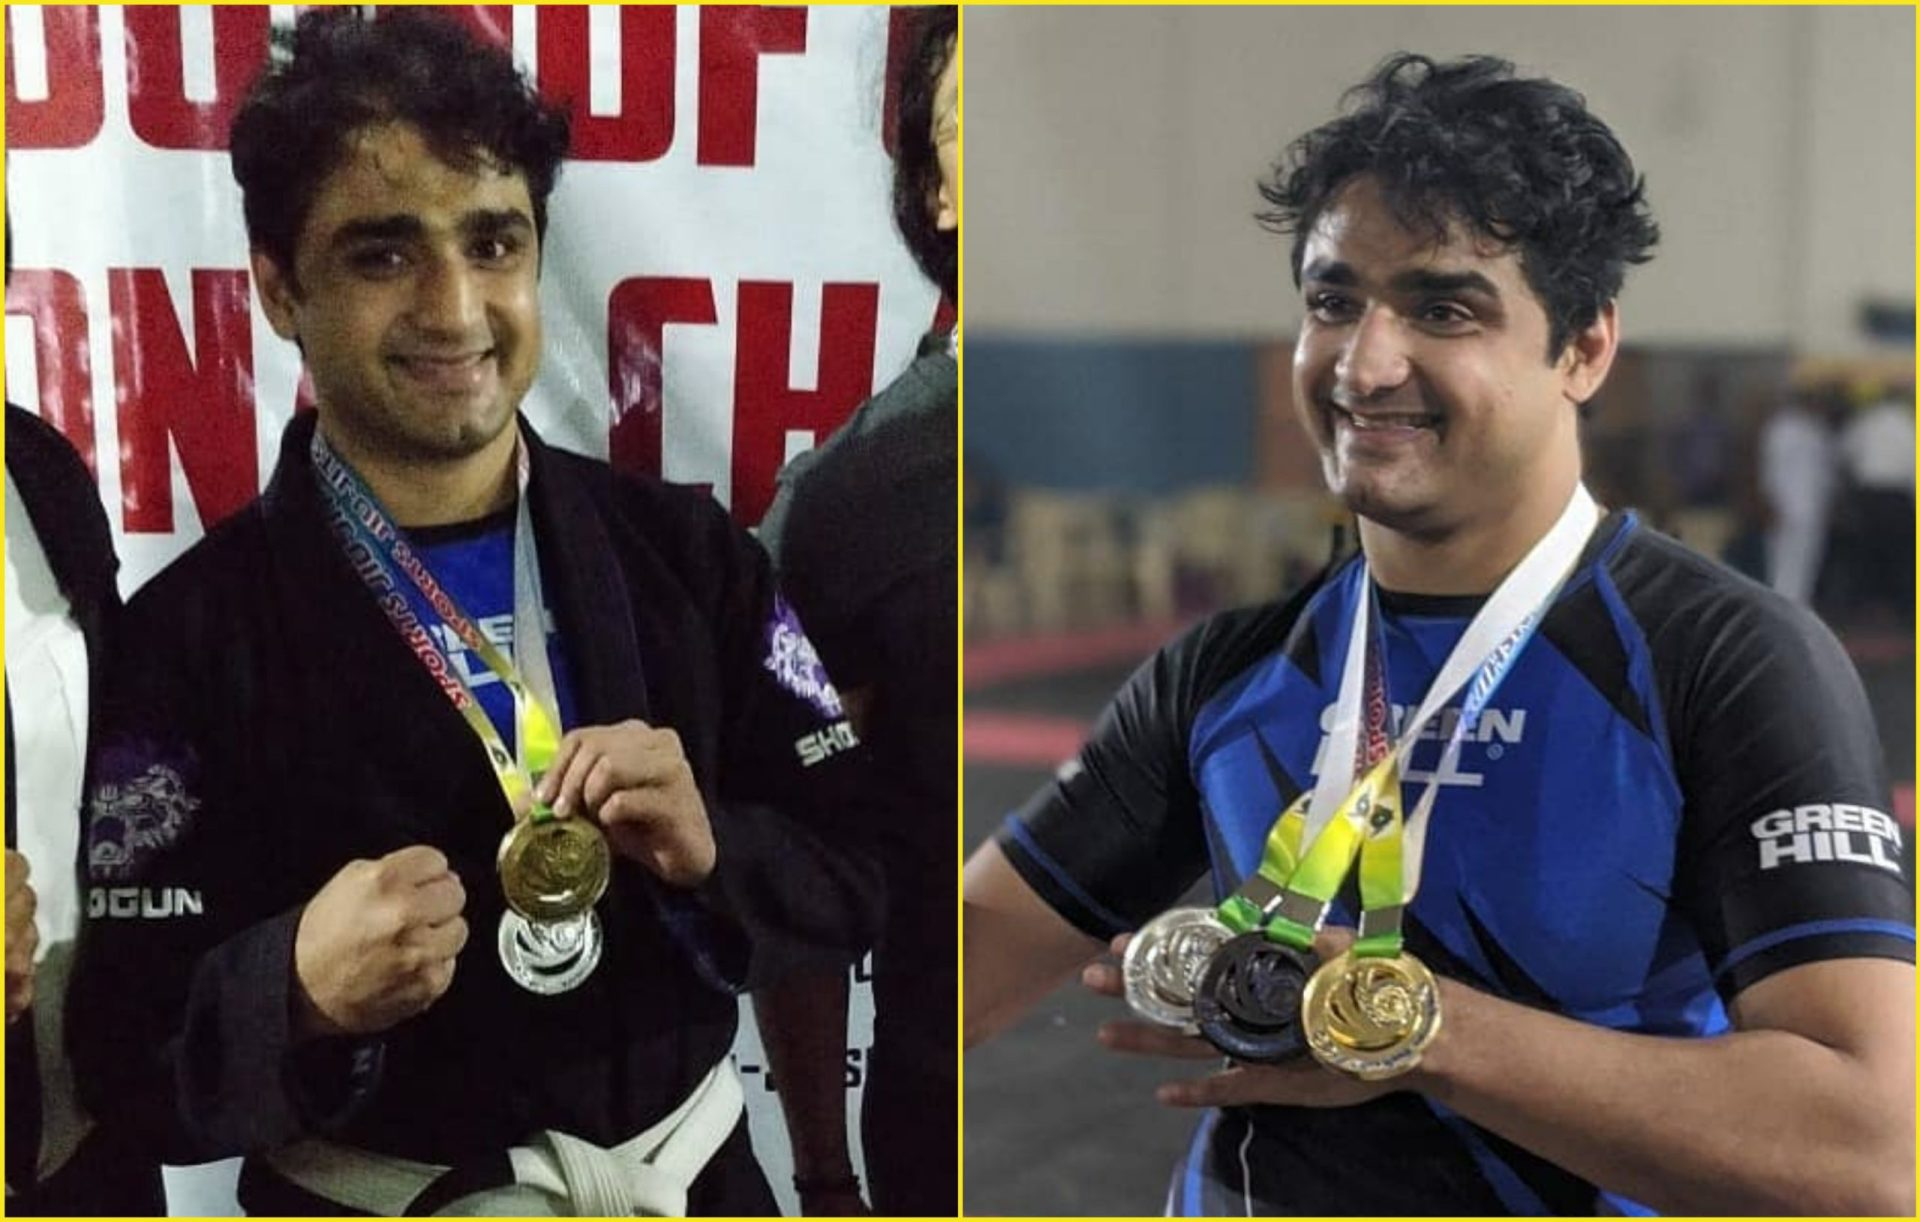 Indian MMA star Vaibhav Shetty to start WBC Muay Thai, WKN Kickboxing, WBF Boxing tournaments in India - Vaibhav Shetty